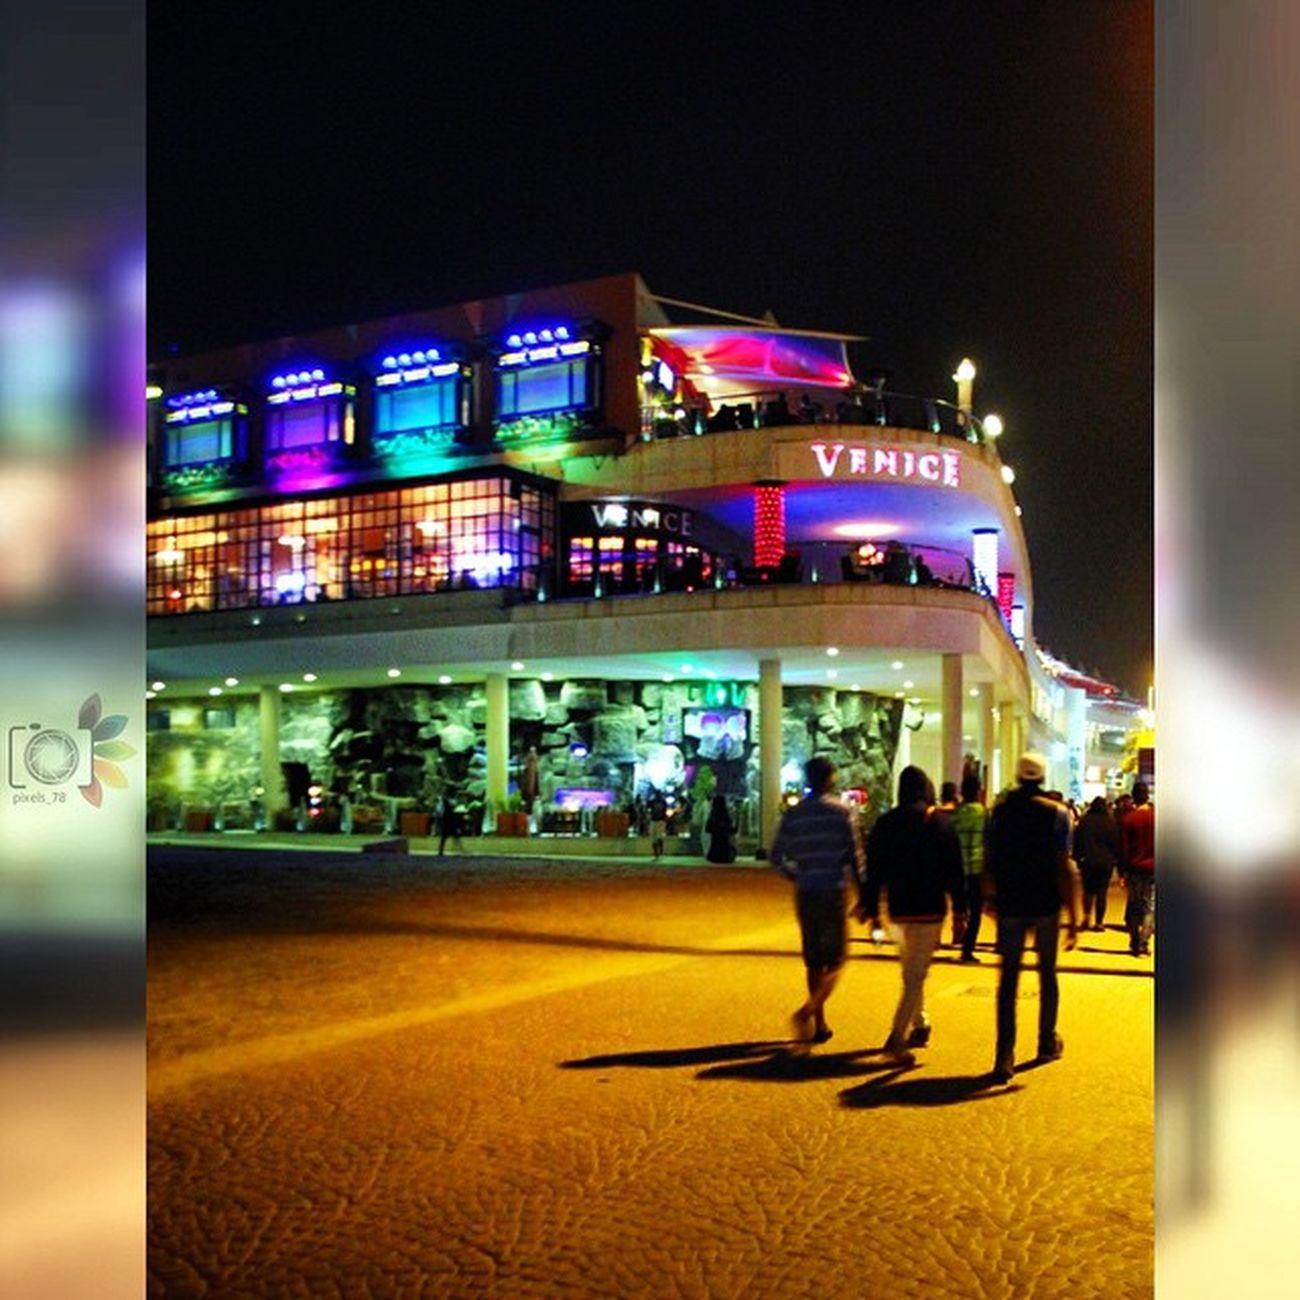 Photography Ios Canon_60_D Sold Venice_cafe @venice_cafe Amwaj_island Bahrain Muharraq East_Riffa Insatpic Instgram Instamood لا ﺗَﺴْﺄﻝ ﺭَﺍﺣِﻼً ﻋَﻦ ﺳَﺒﺐ ﺭَﺣﻴﻠﻪ ! ﻓَﻘَﺪ ﺟَﻬّﺰ [ ﻋُﺬﺭَﻩُ ] ﻗَﺒﻞَ [ ﺣَﻘَﺎﺋﺒﻪ ] !,